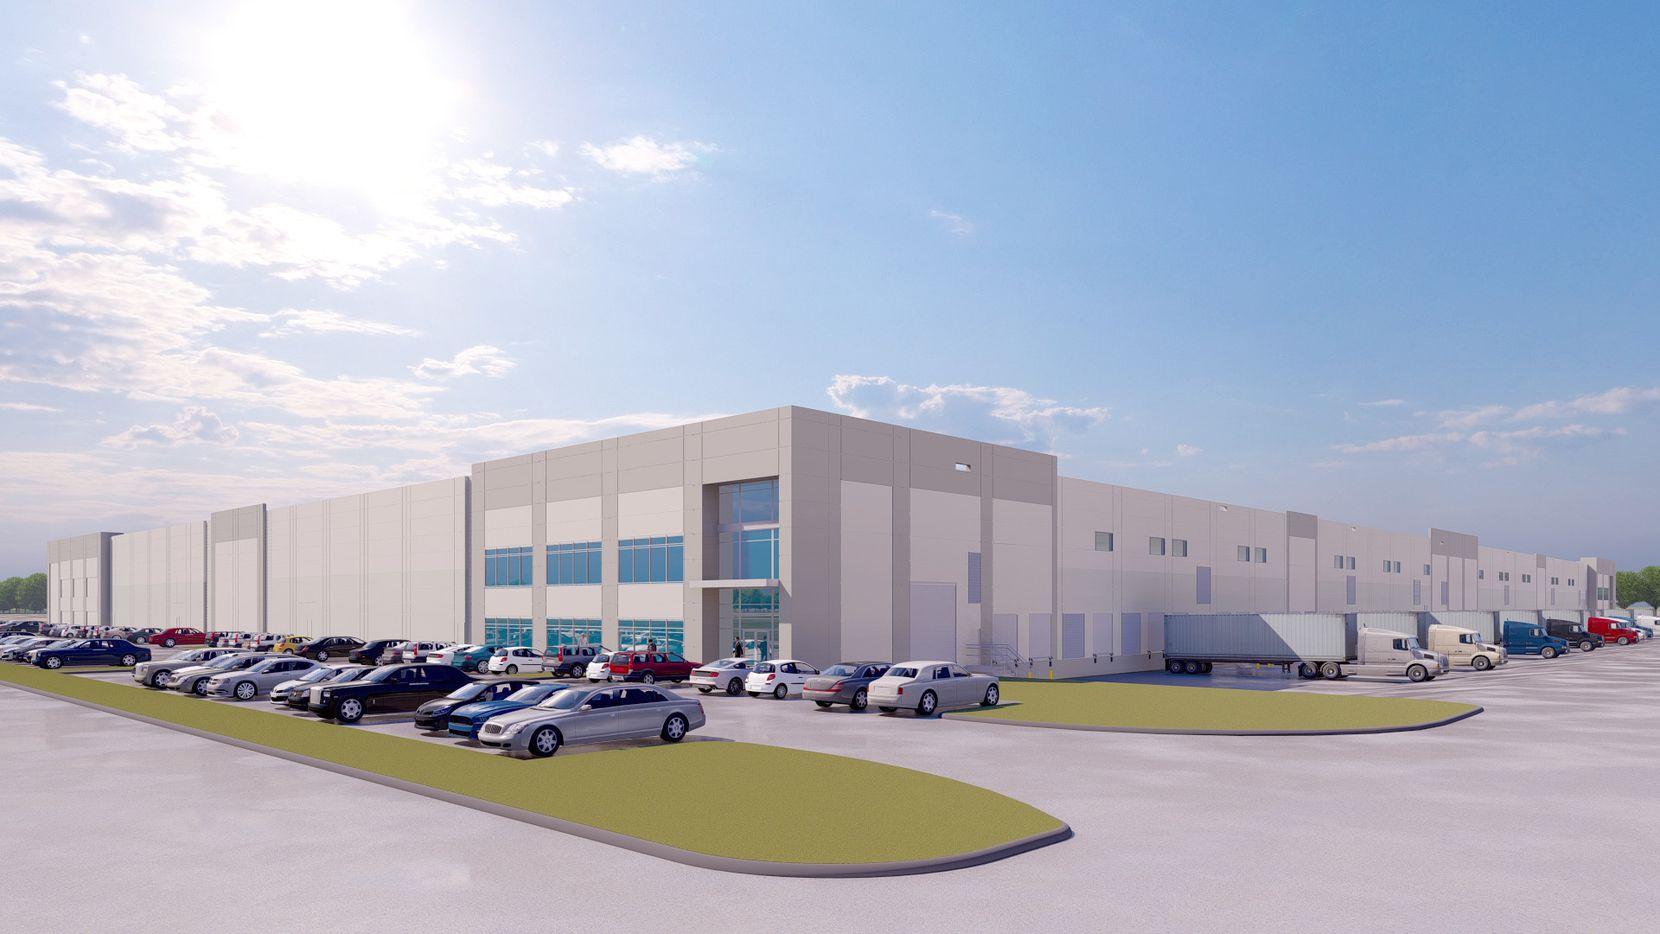 Duke Realty is building the Yokohama Tire shipping center in Wilmer.